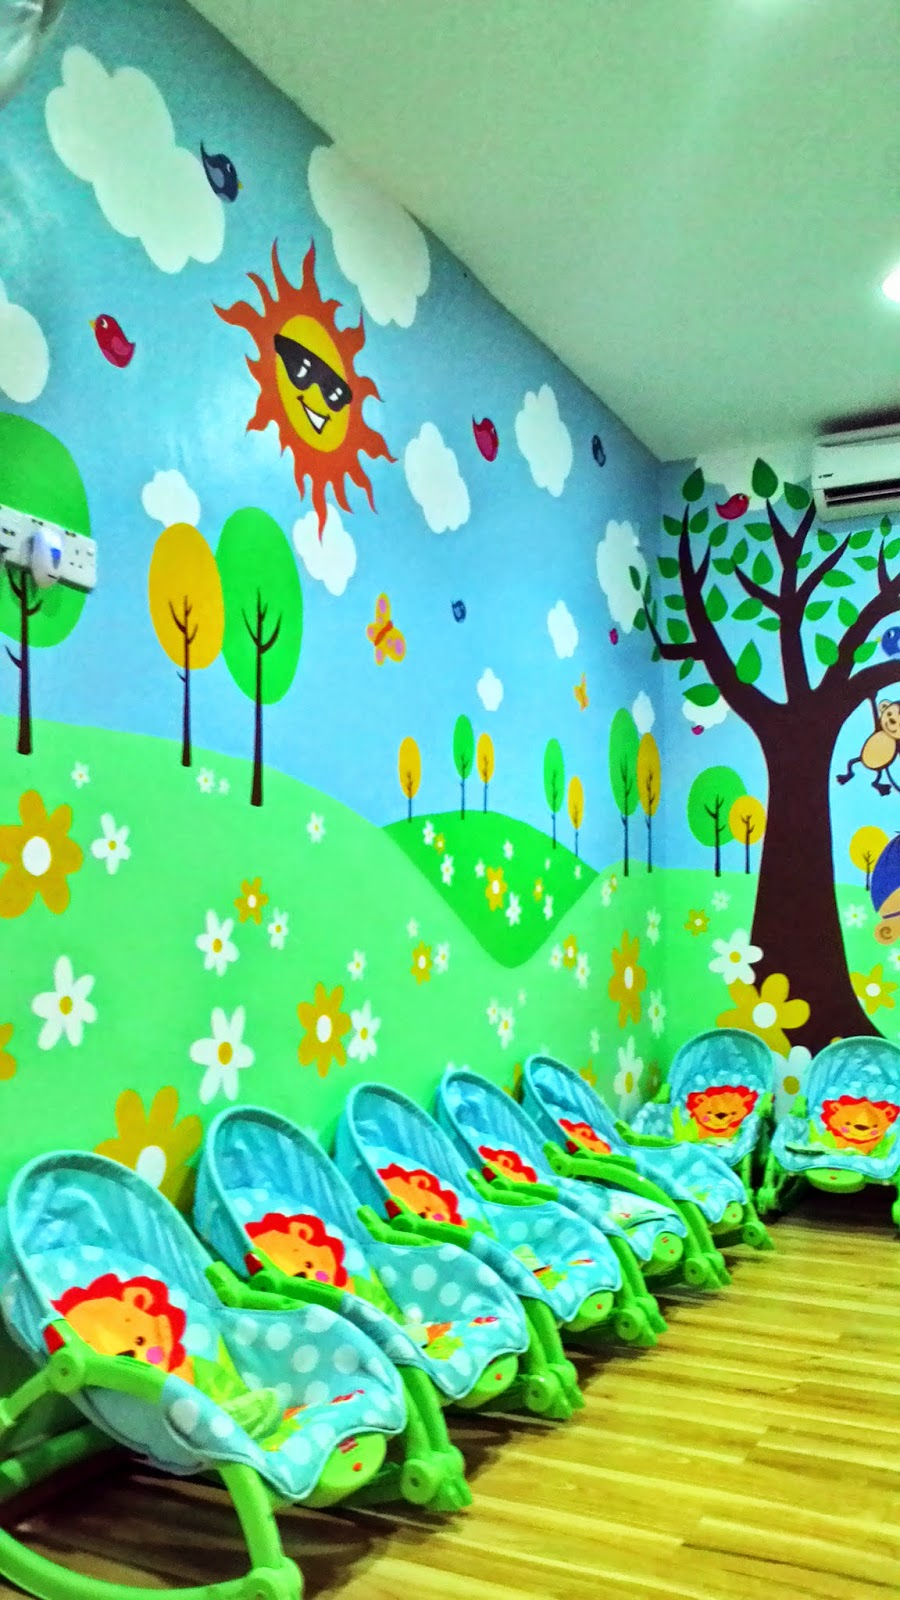 Warna arts mural my kids academy for Mural tadika